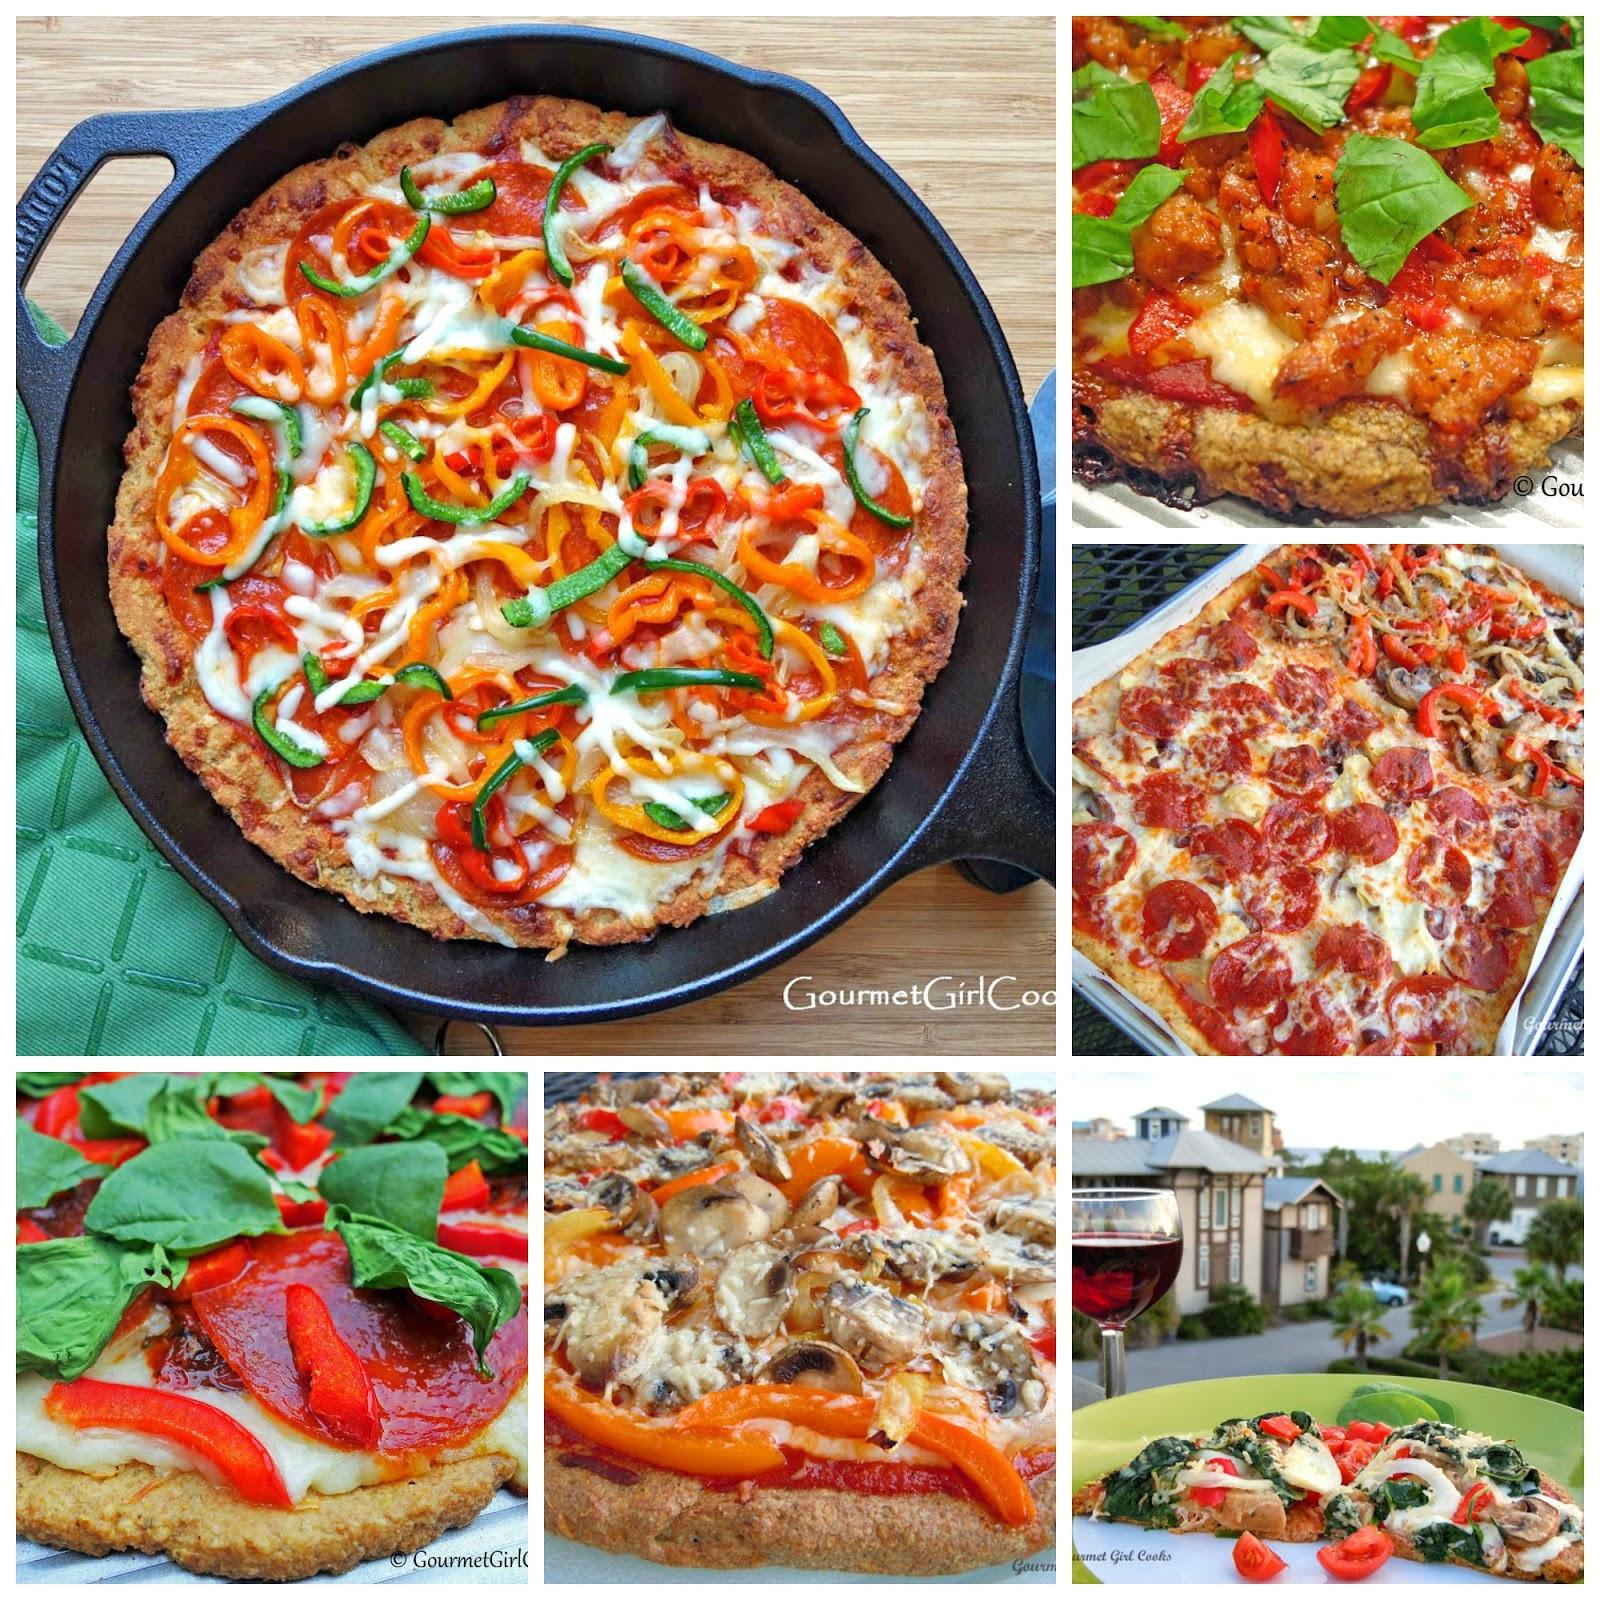 Gourmet Pizza Dough Recipe  Gourmet Girl Cooks 5 Amazing Pizza Crust Recipes Low